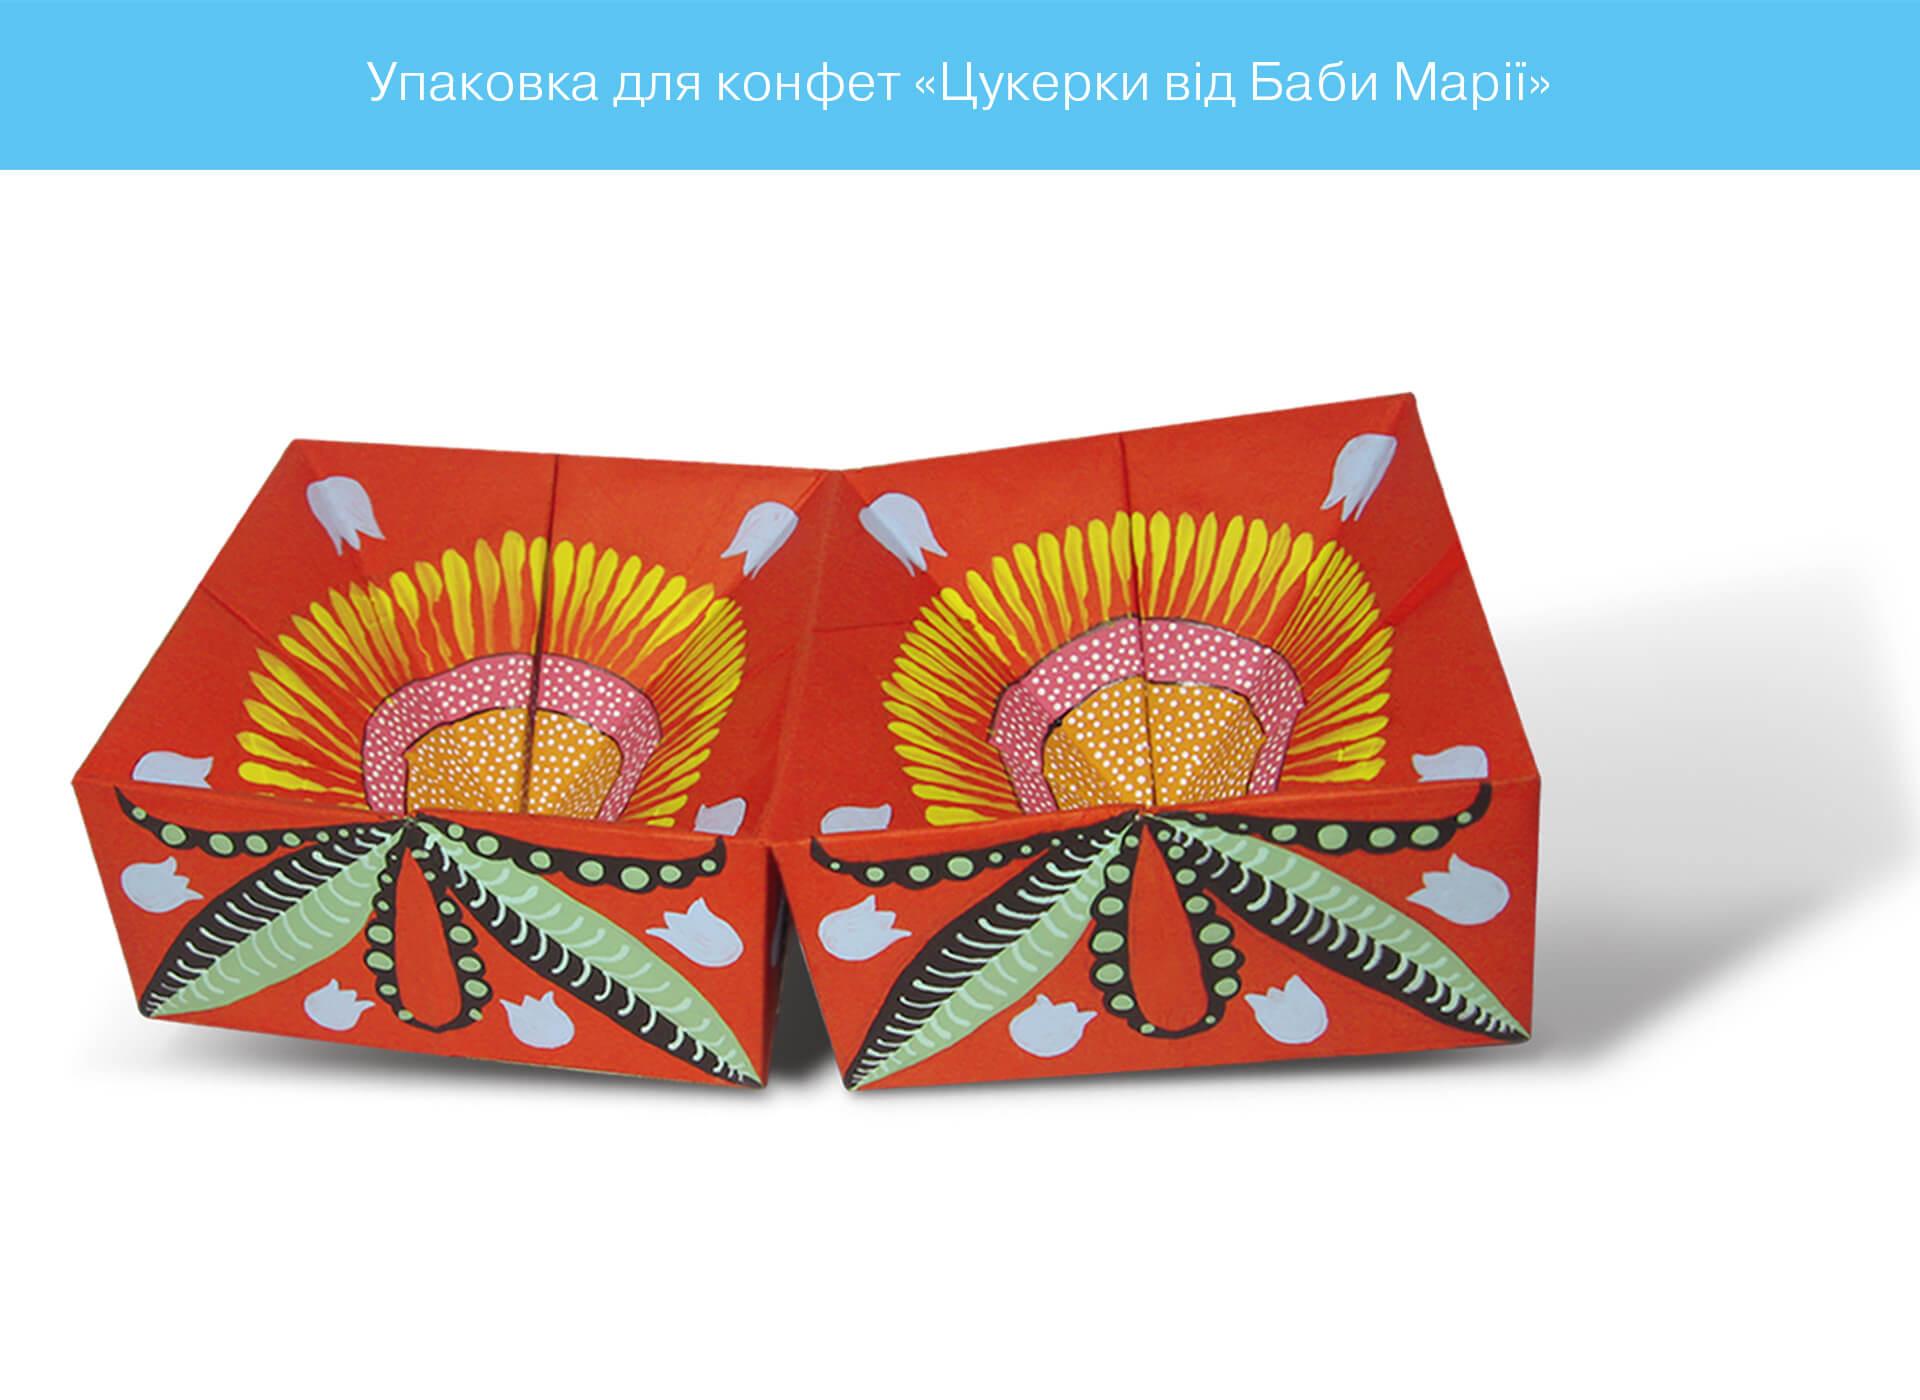 prokochuk_irina_packing-tsukerki-od-babi-mari%d1%97_3